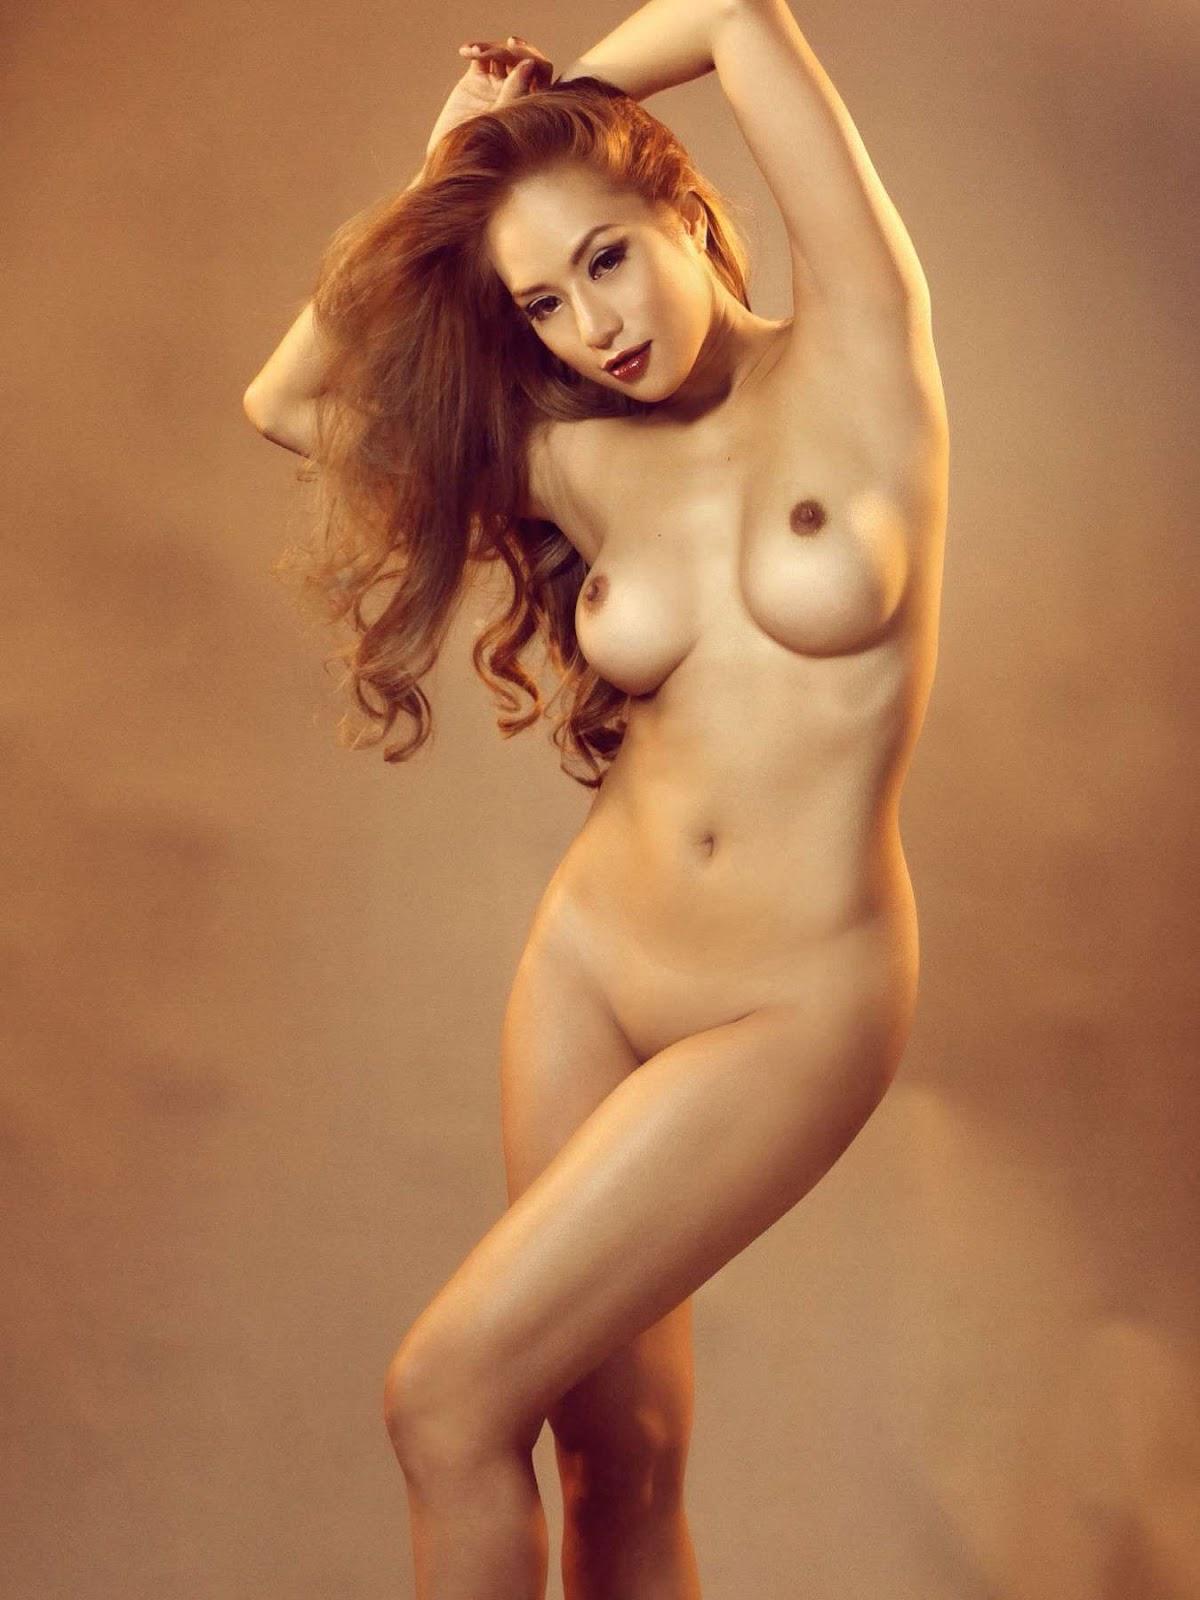 horny lesbian with dildo